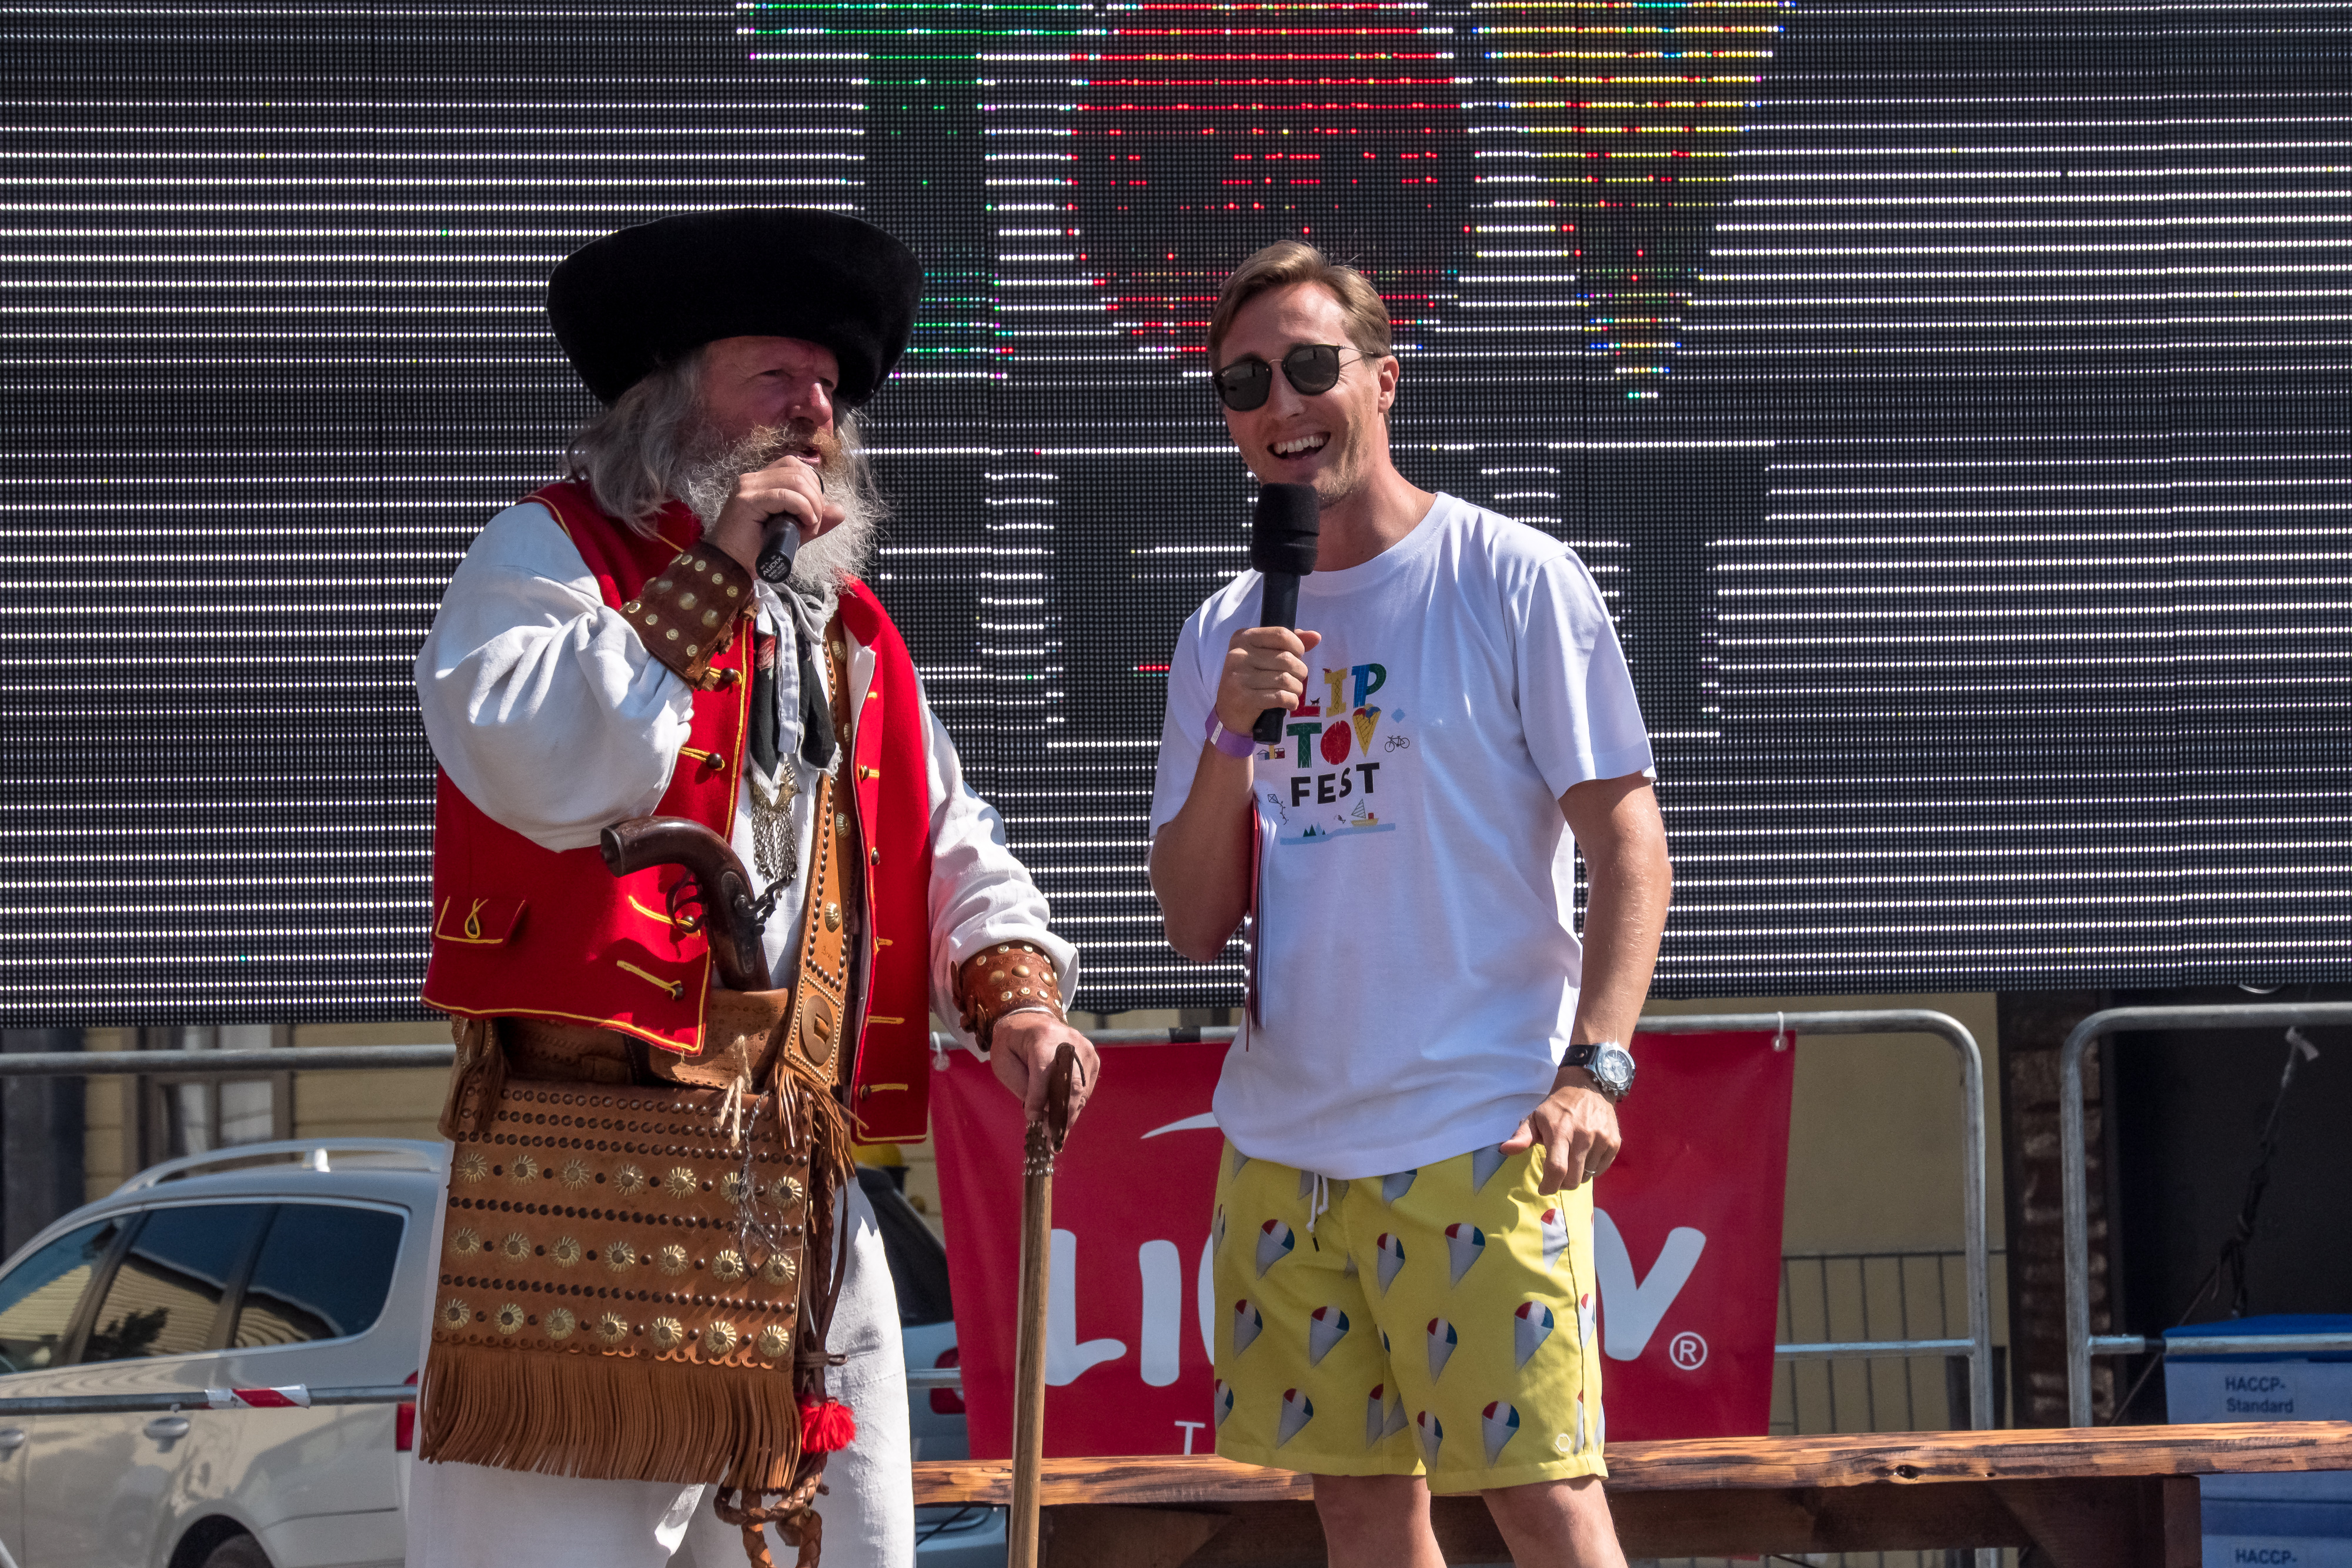 liptovfest